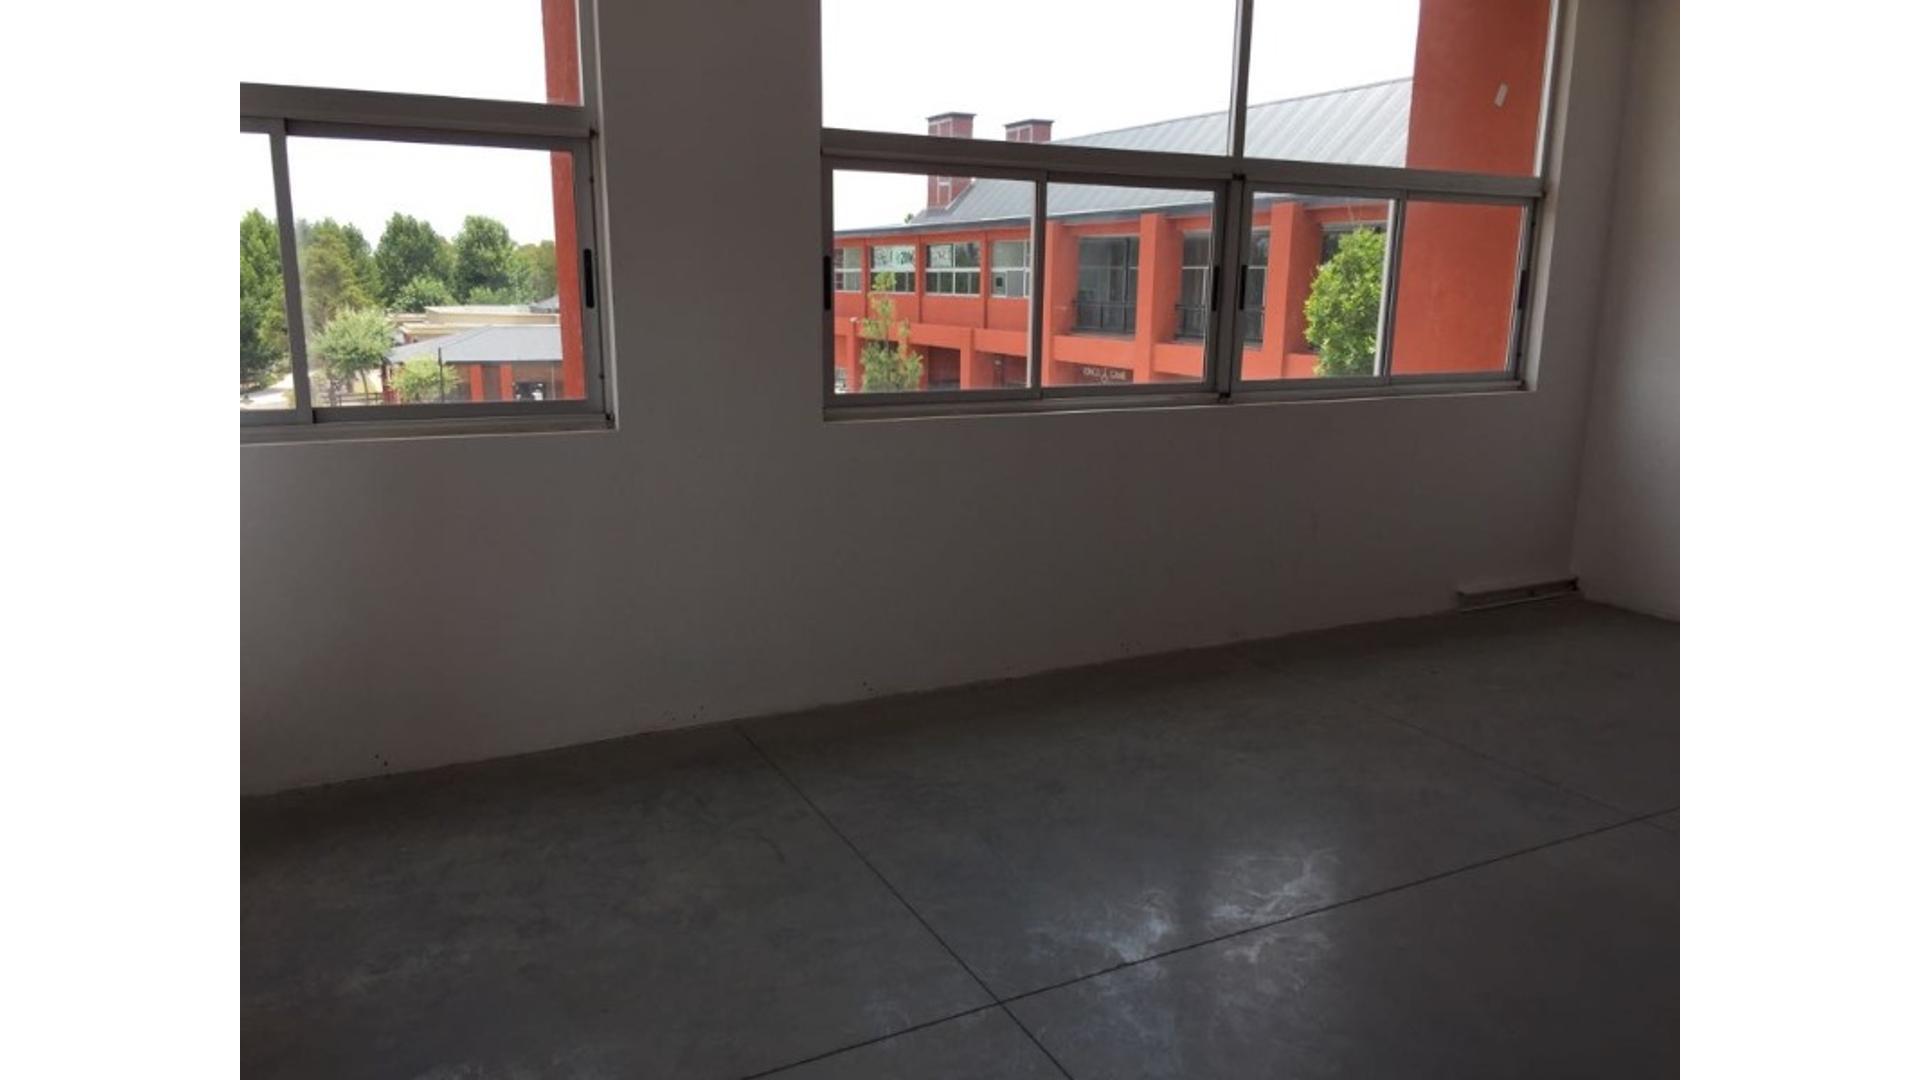 Pilara Lote / N° 2 - U$D 90.000 - Oficina en Venta